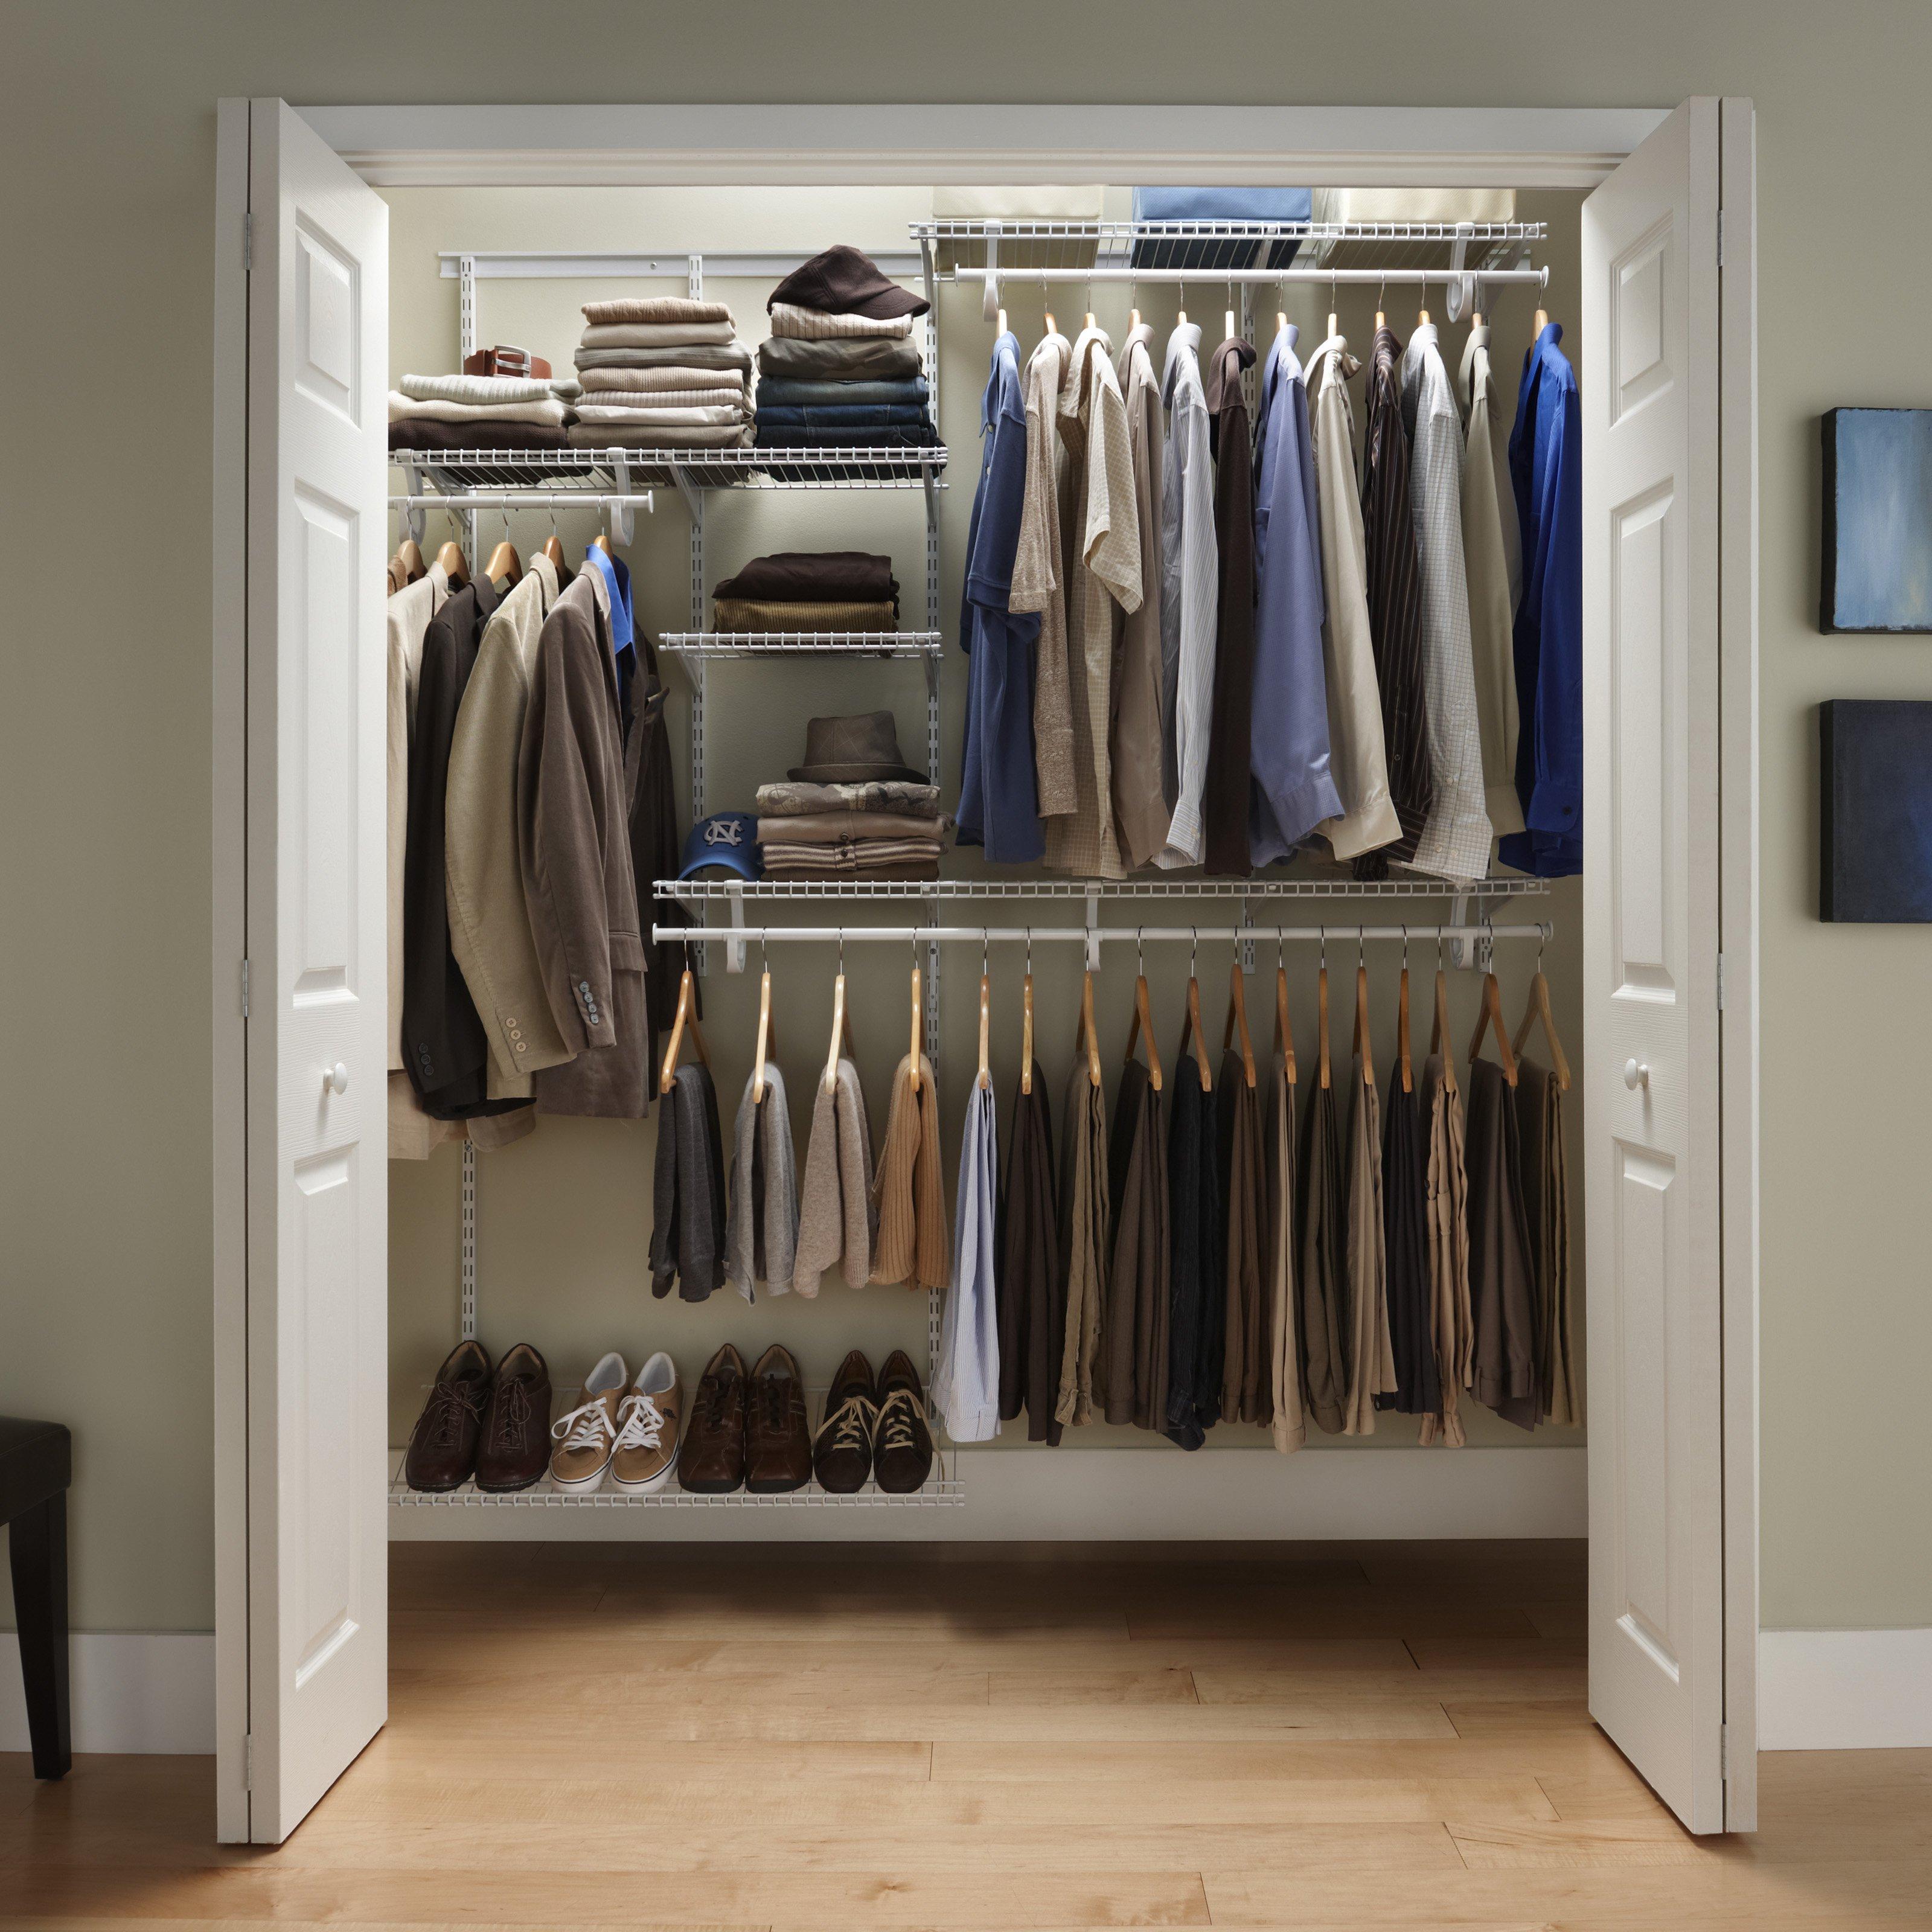 Closetmaid Shelf Rail 5-8 Feet Closet Organizer Kit |  Hay needle FIBKPFR